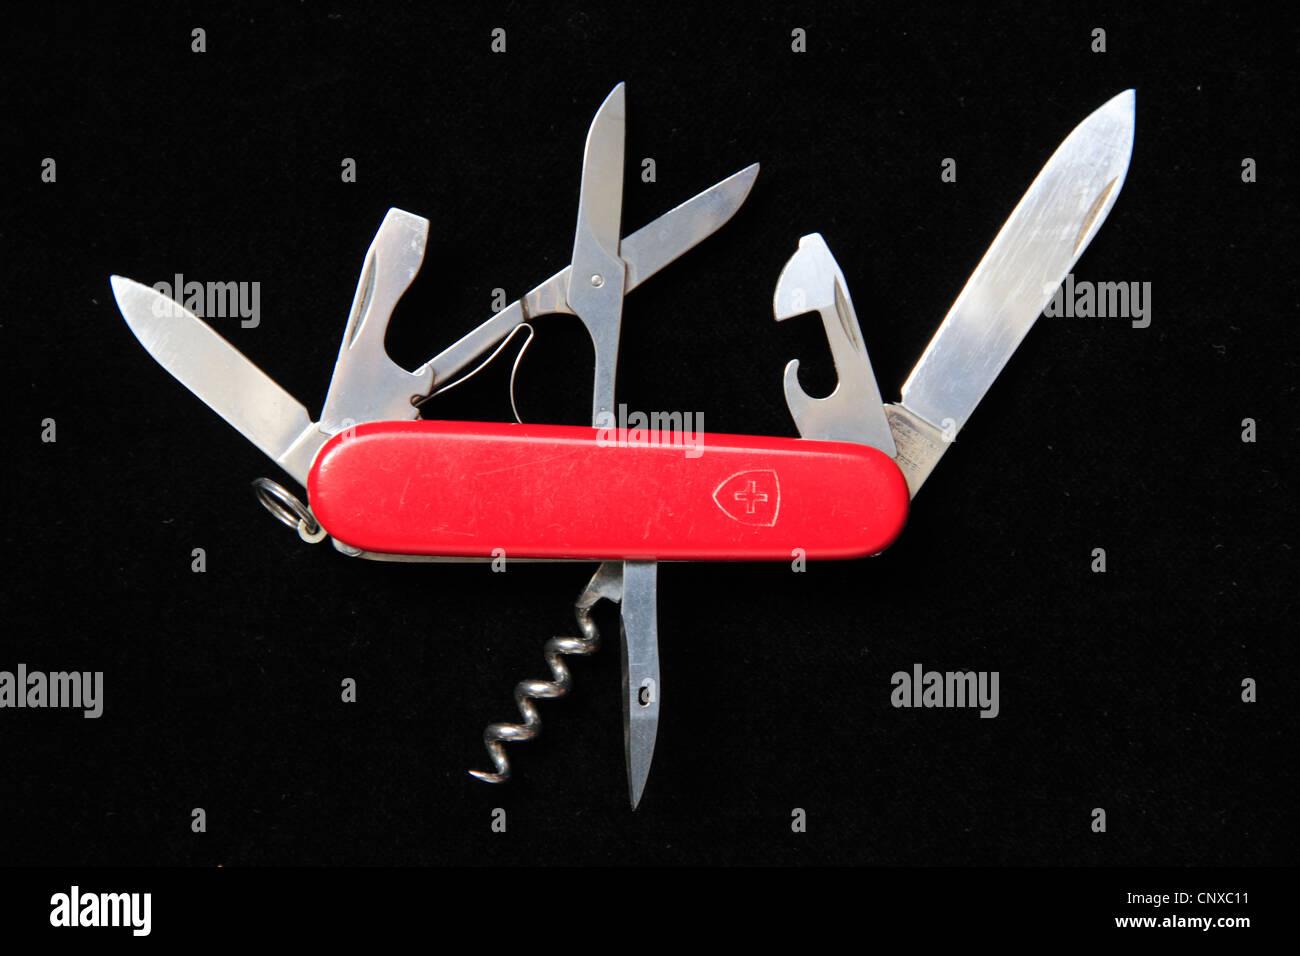 Swiss Army knife - Stock Image